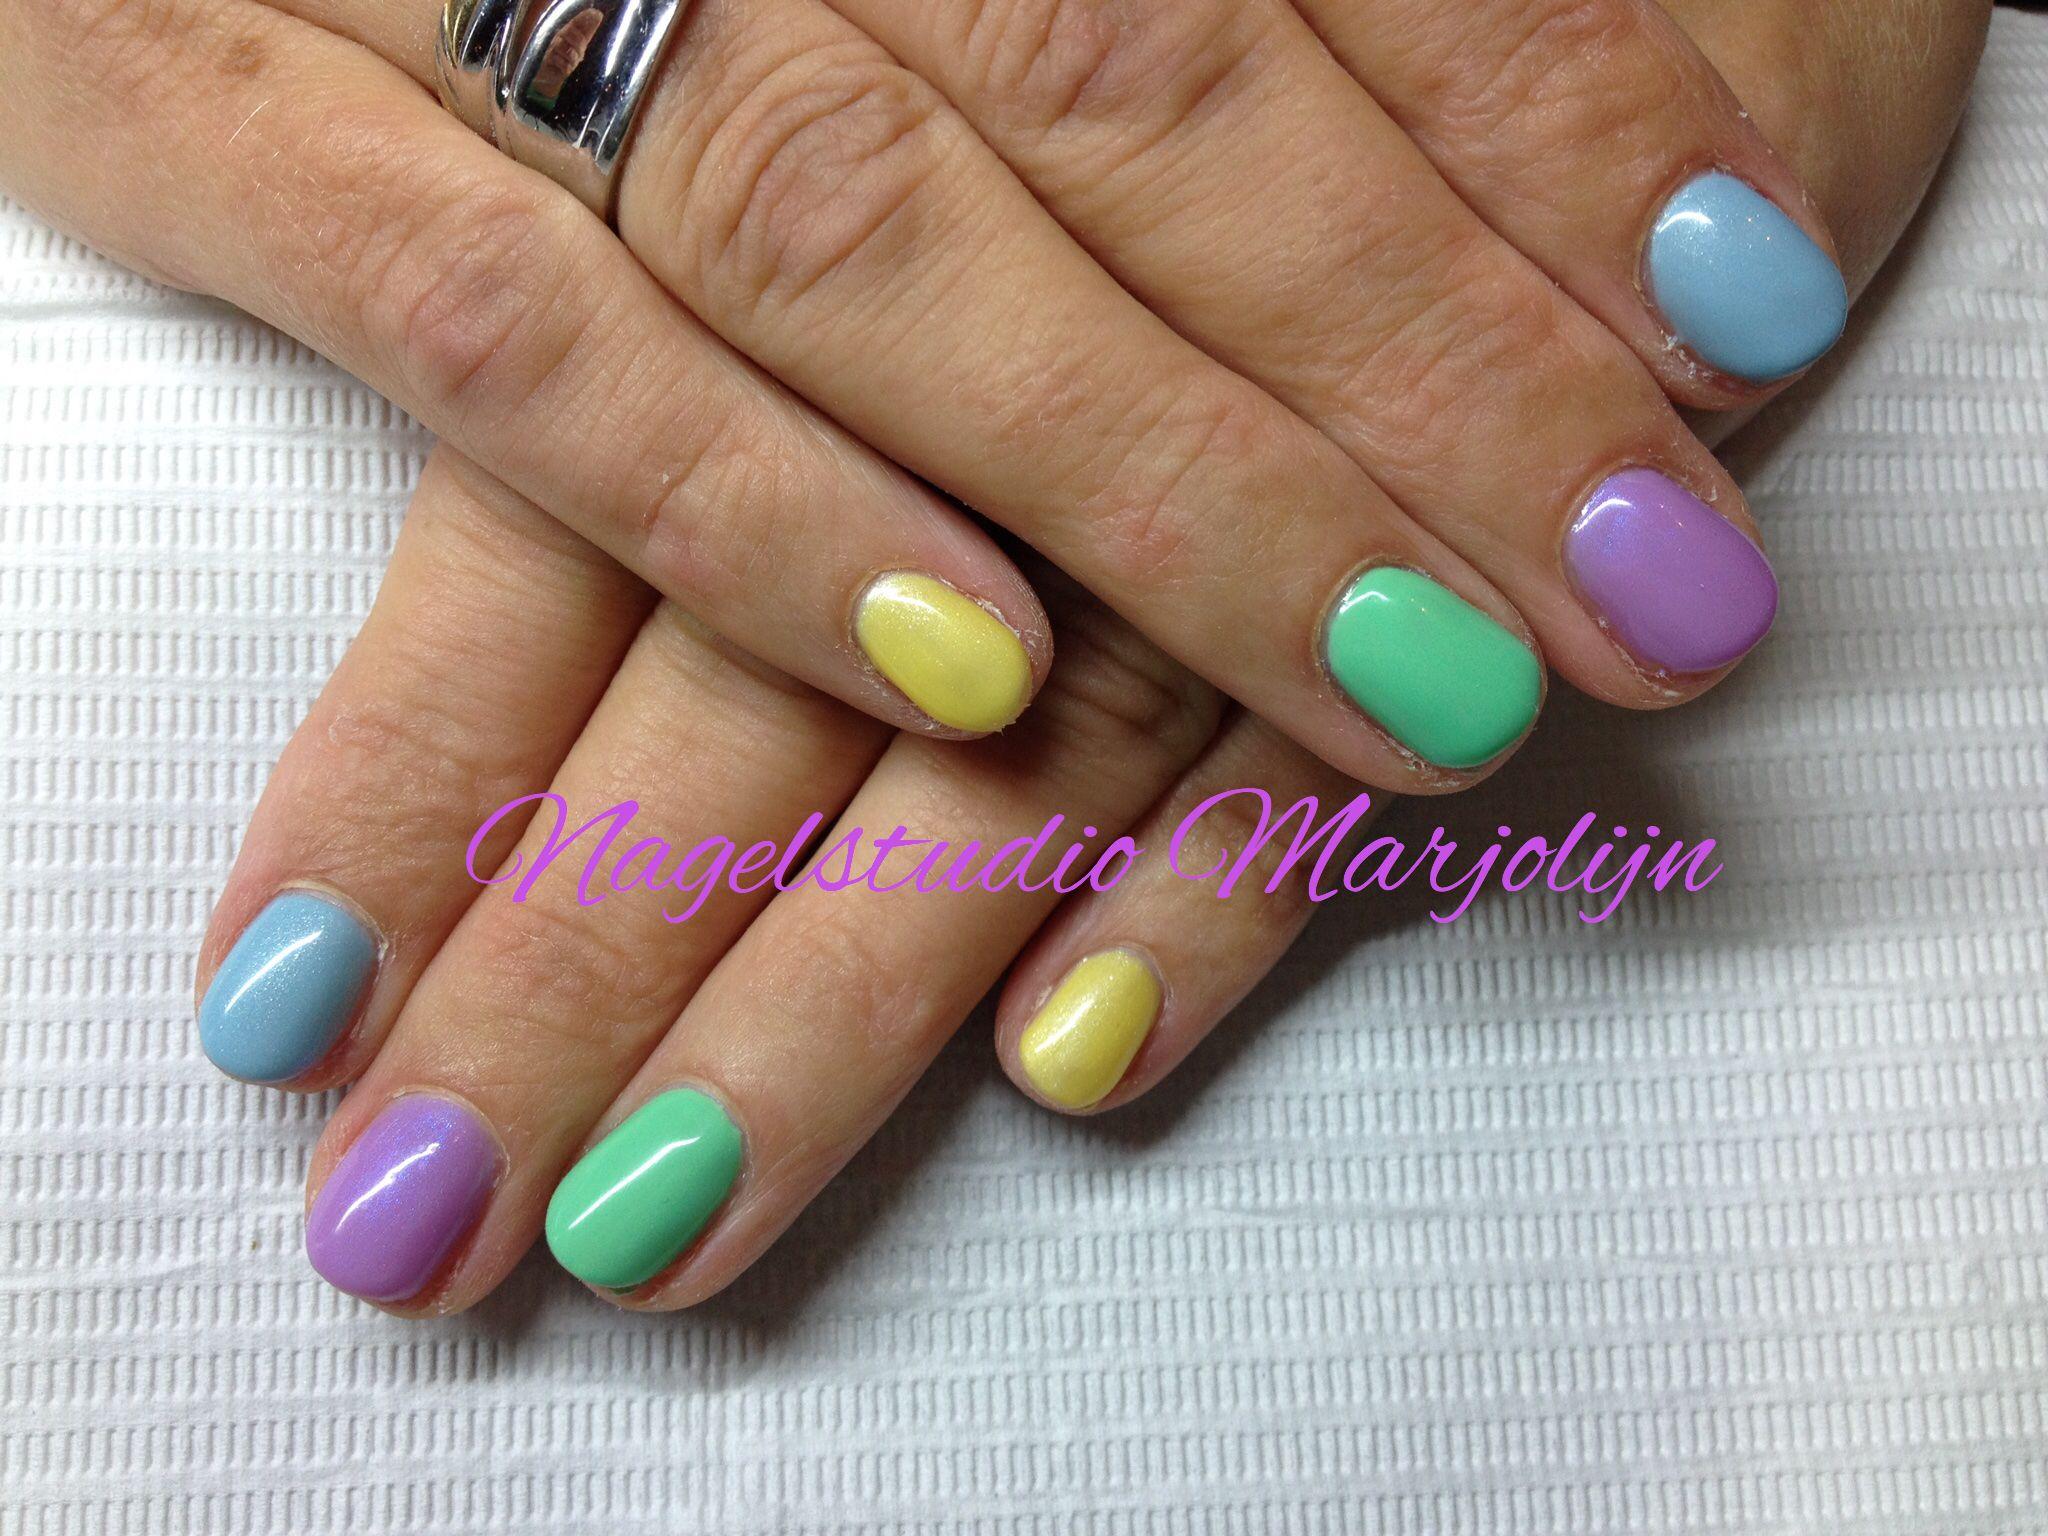 Full color nail art - Pastel Spring Nails Nailart Gel Fullcolor Nagelstudiomar